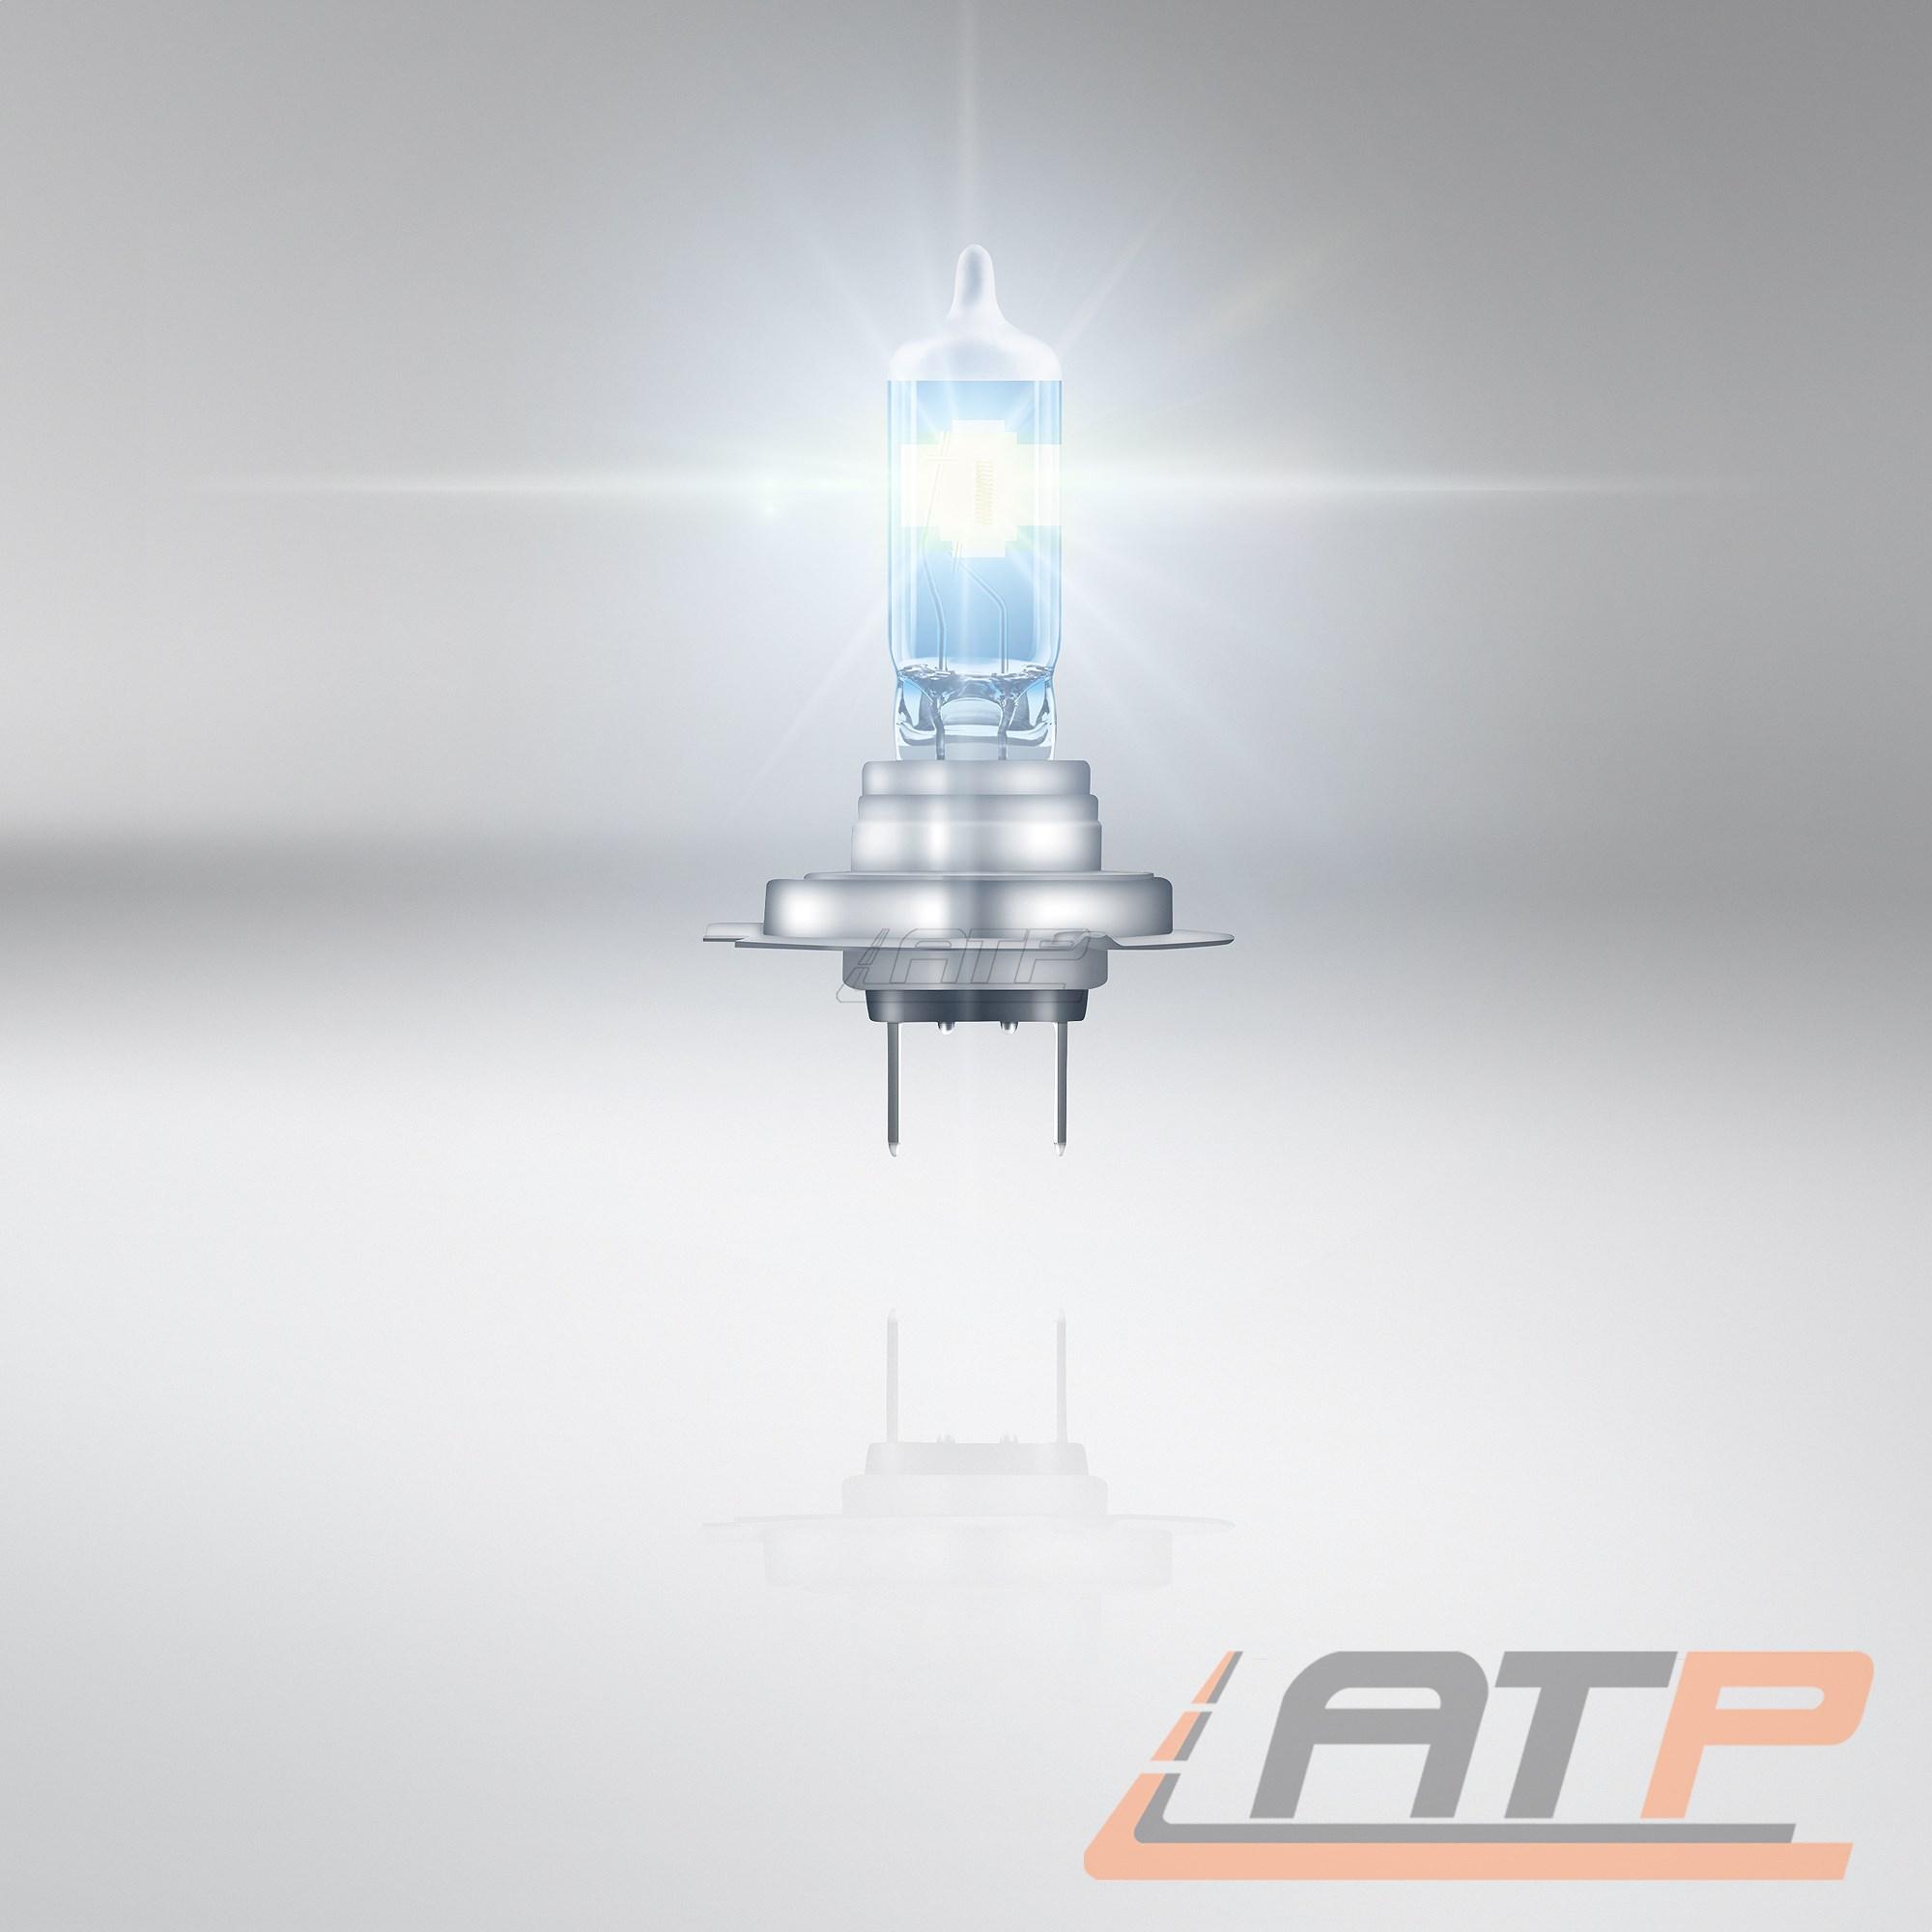 osram night breaker laser h7 next generation halogen scheinwerferlampe 12v ebay. Black Bedroom Furniture Sets. Home Design Ideas